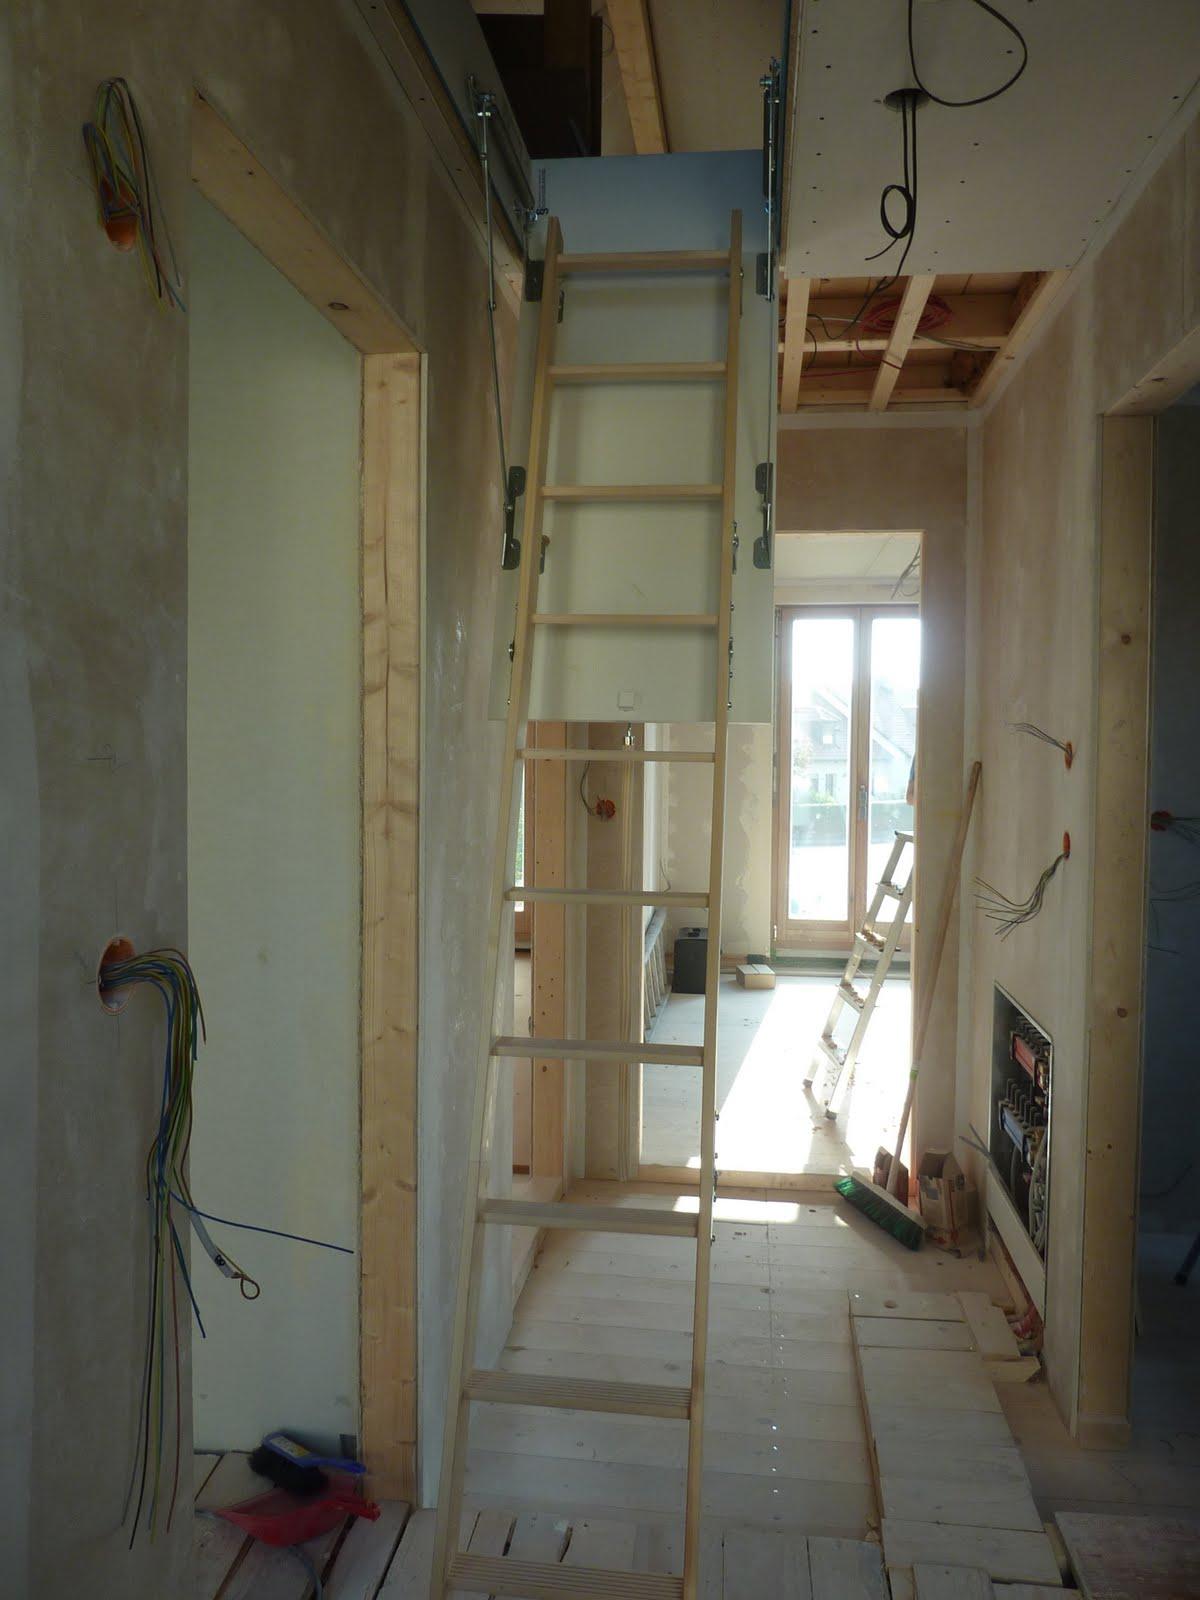 Hausbau mit Murr Holzhaus Neuburg: Dachbodentreppe, Decke